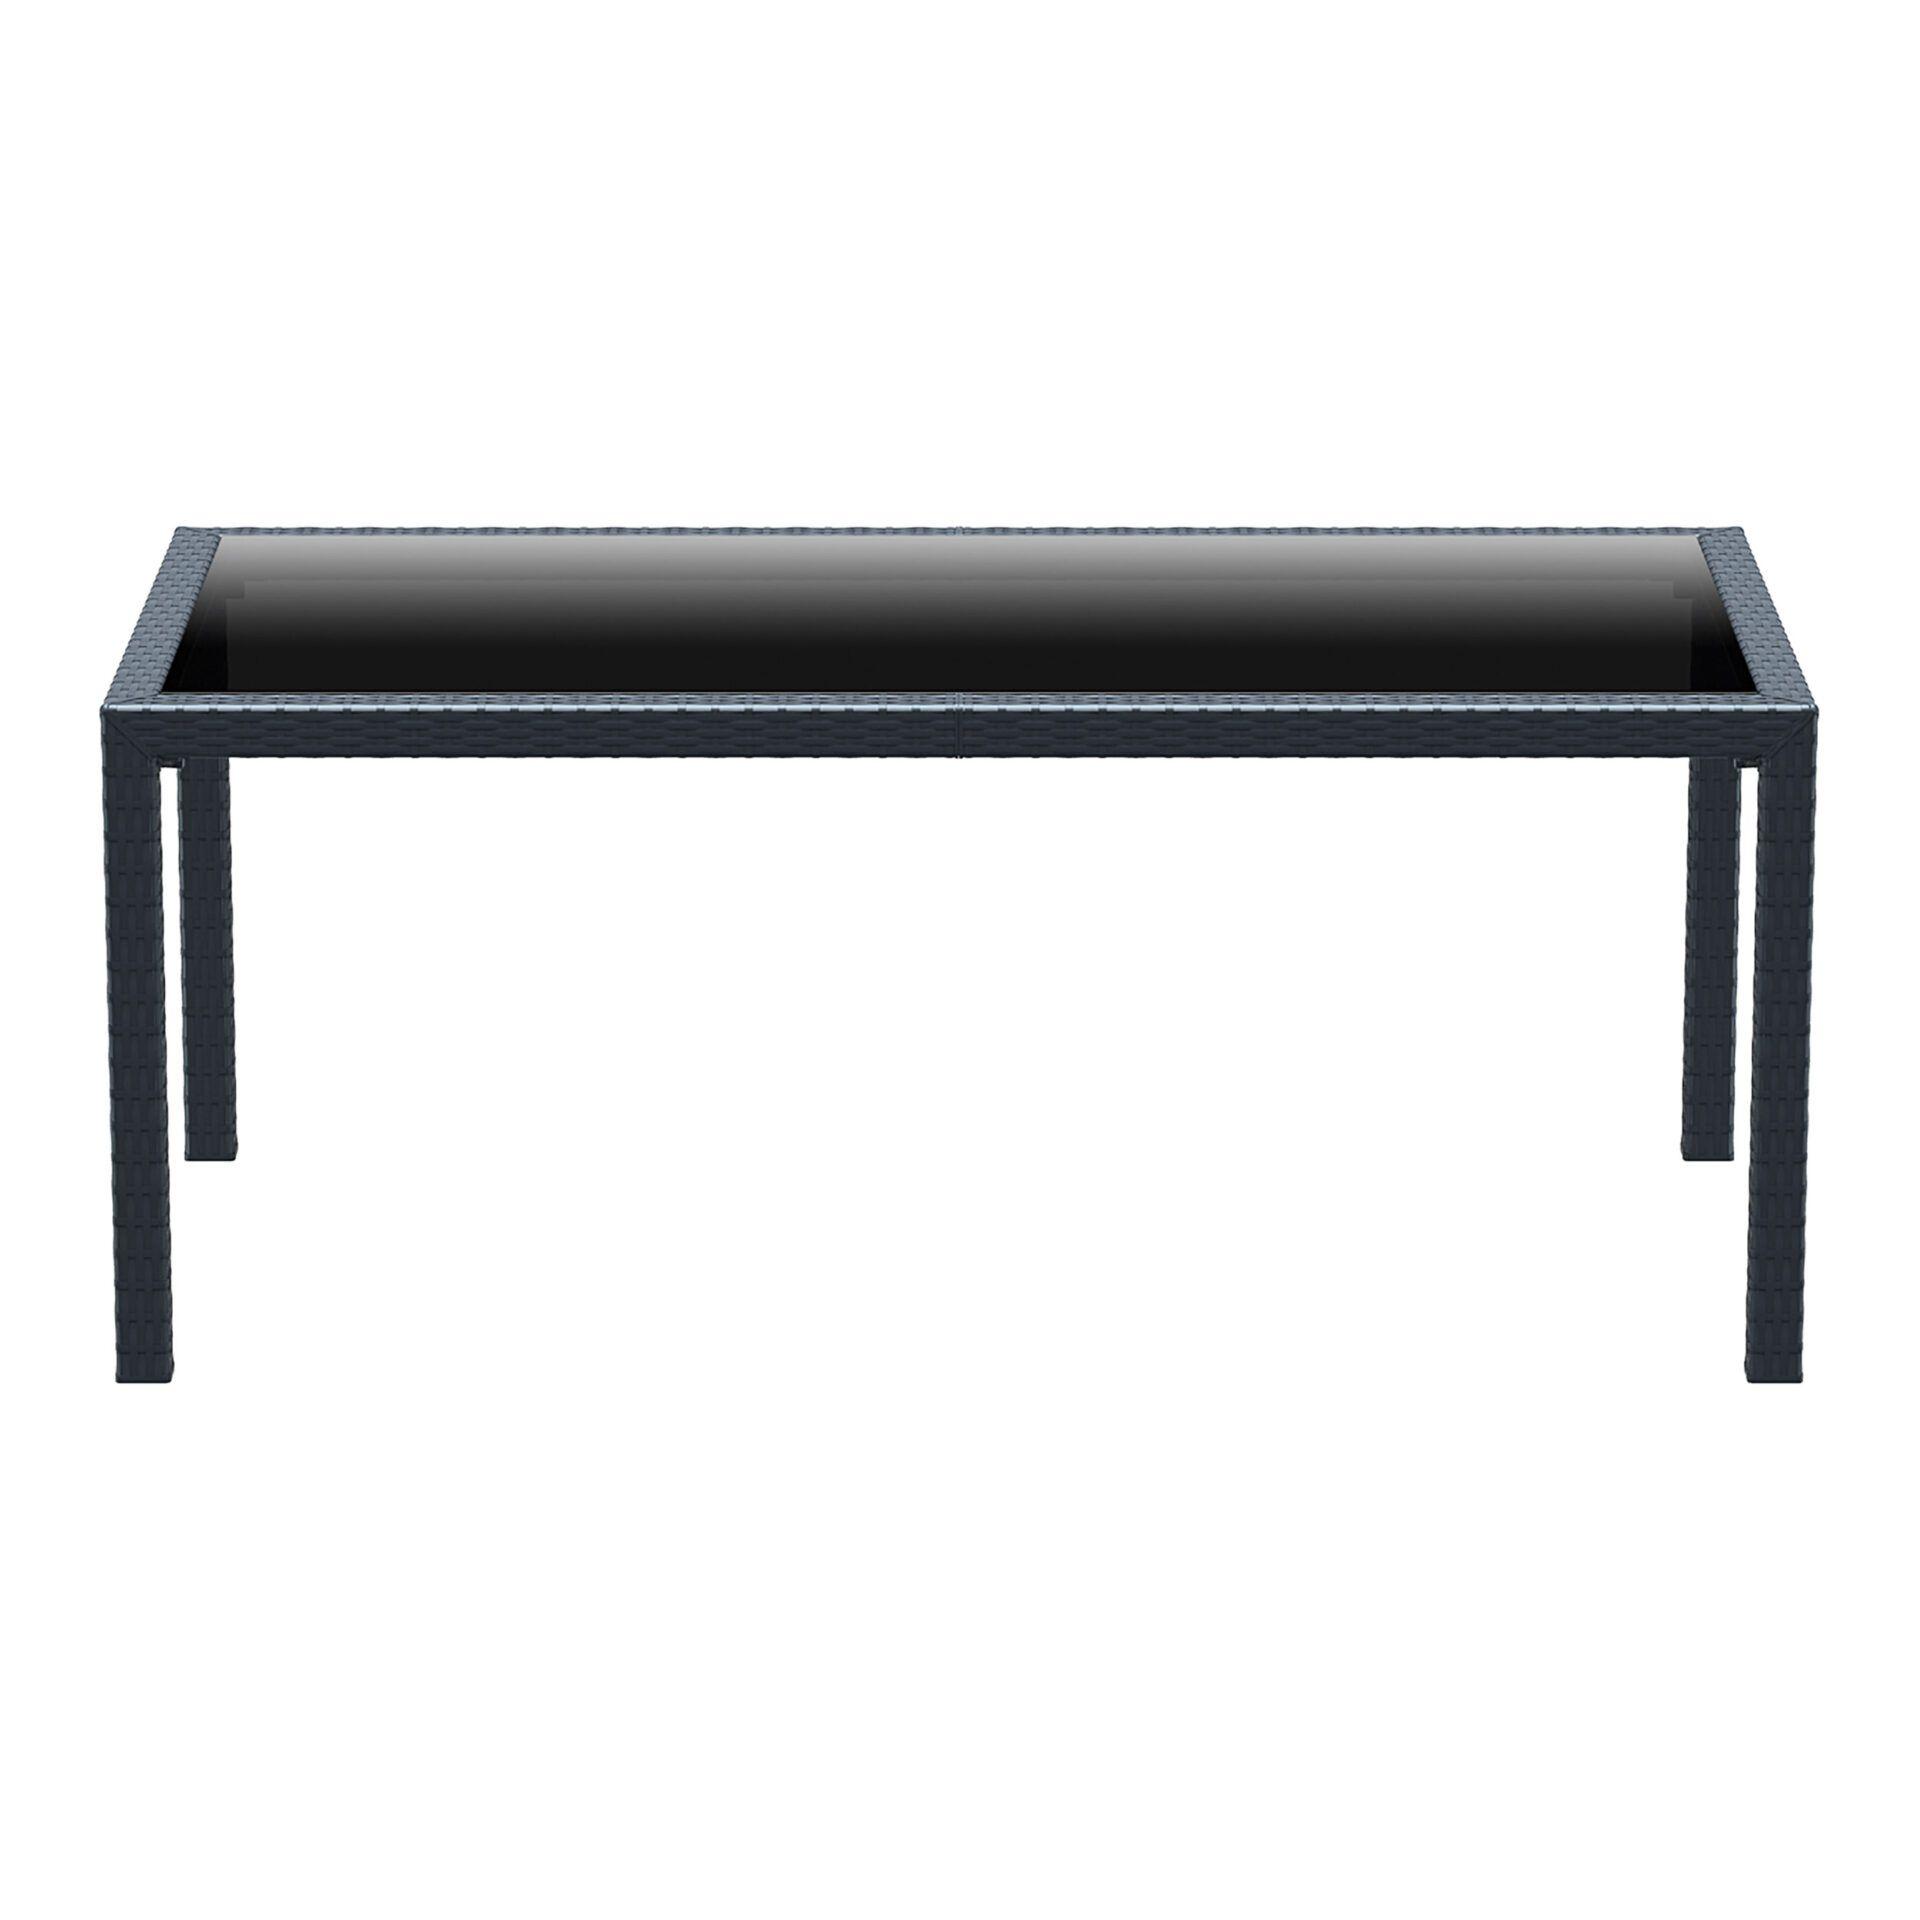 outdoor resin rattan dining glass top tahiti table darkgrey long edge